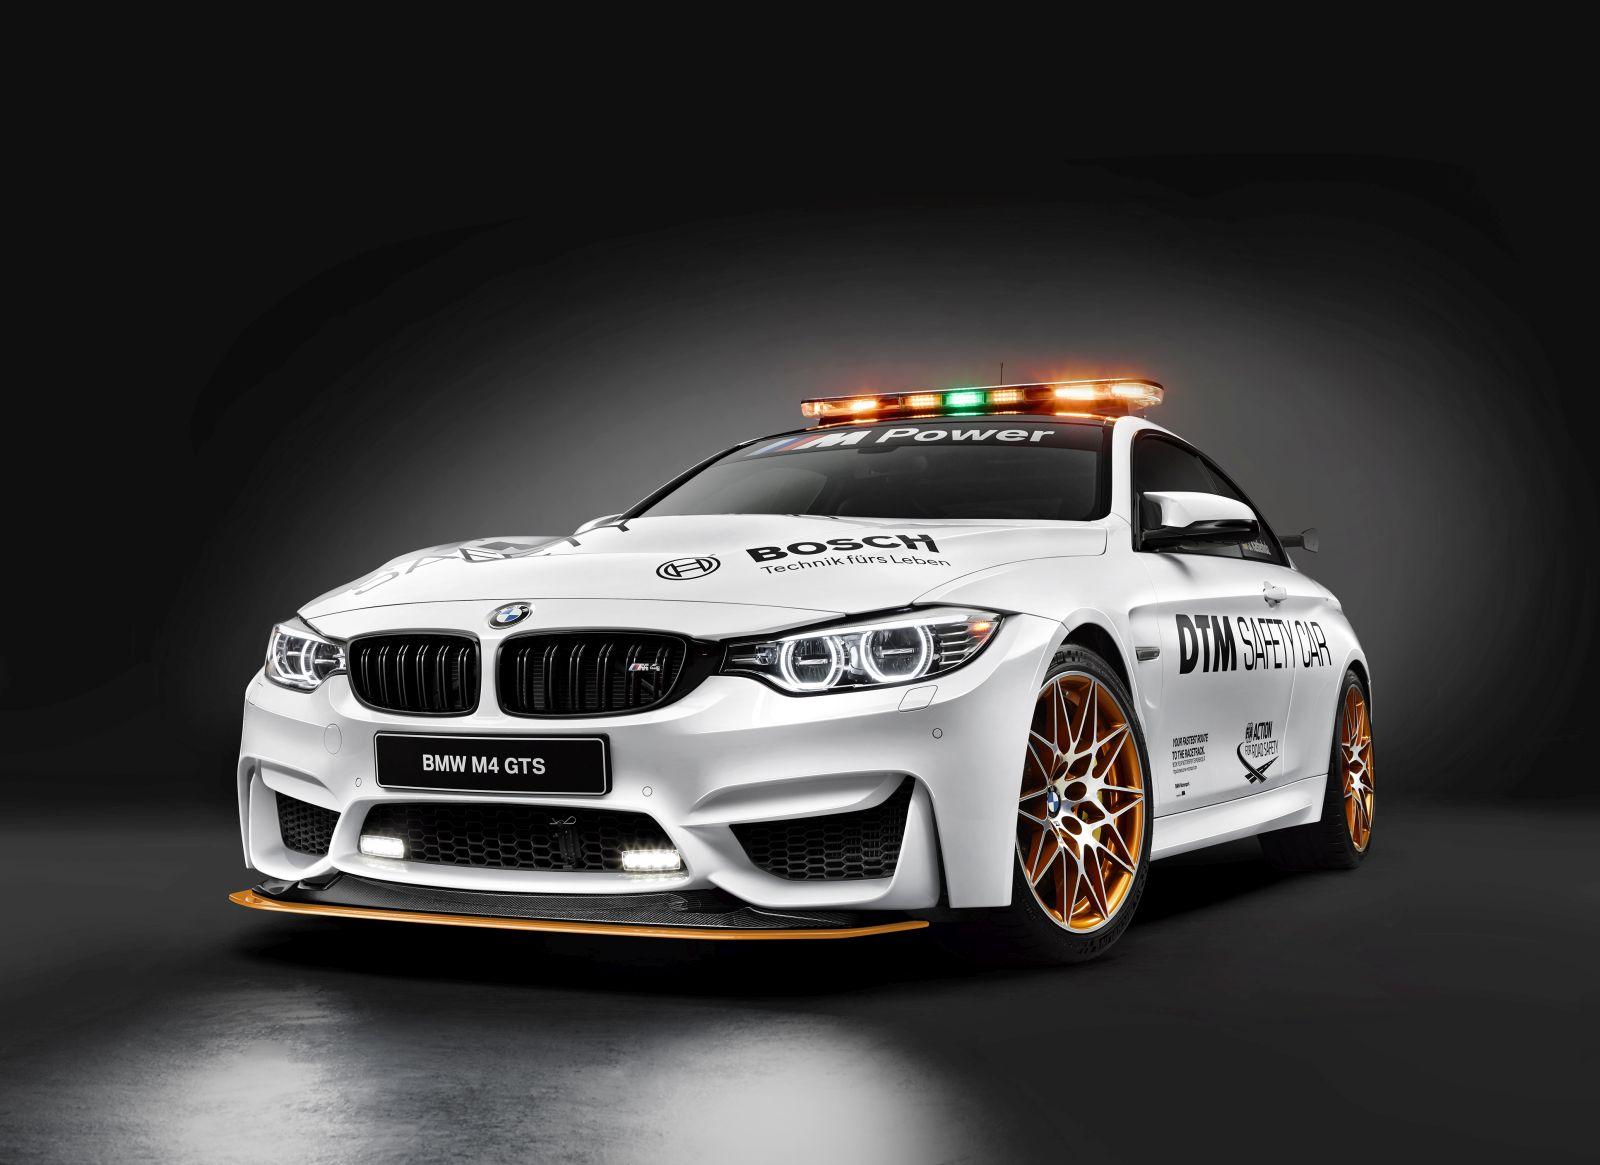 BMW M4 GTS - DTM Safety Car (1)